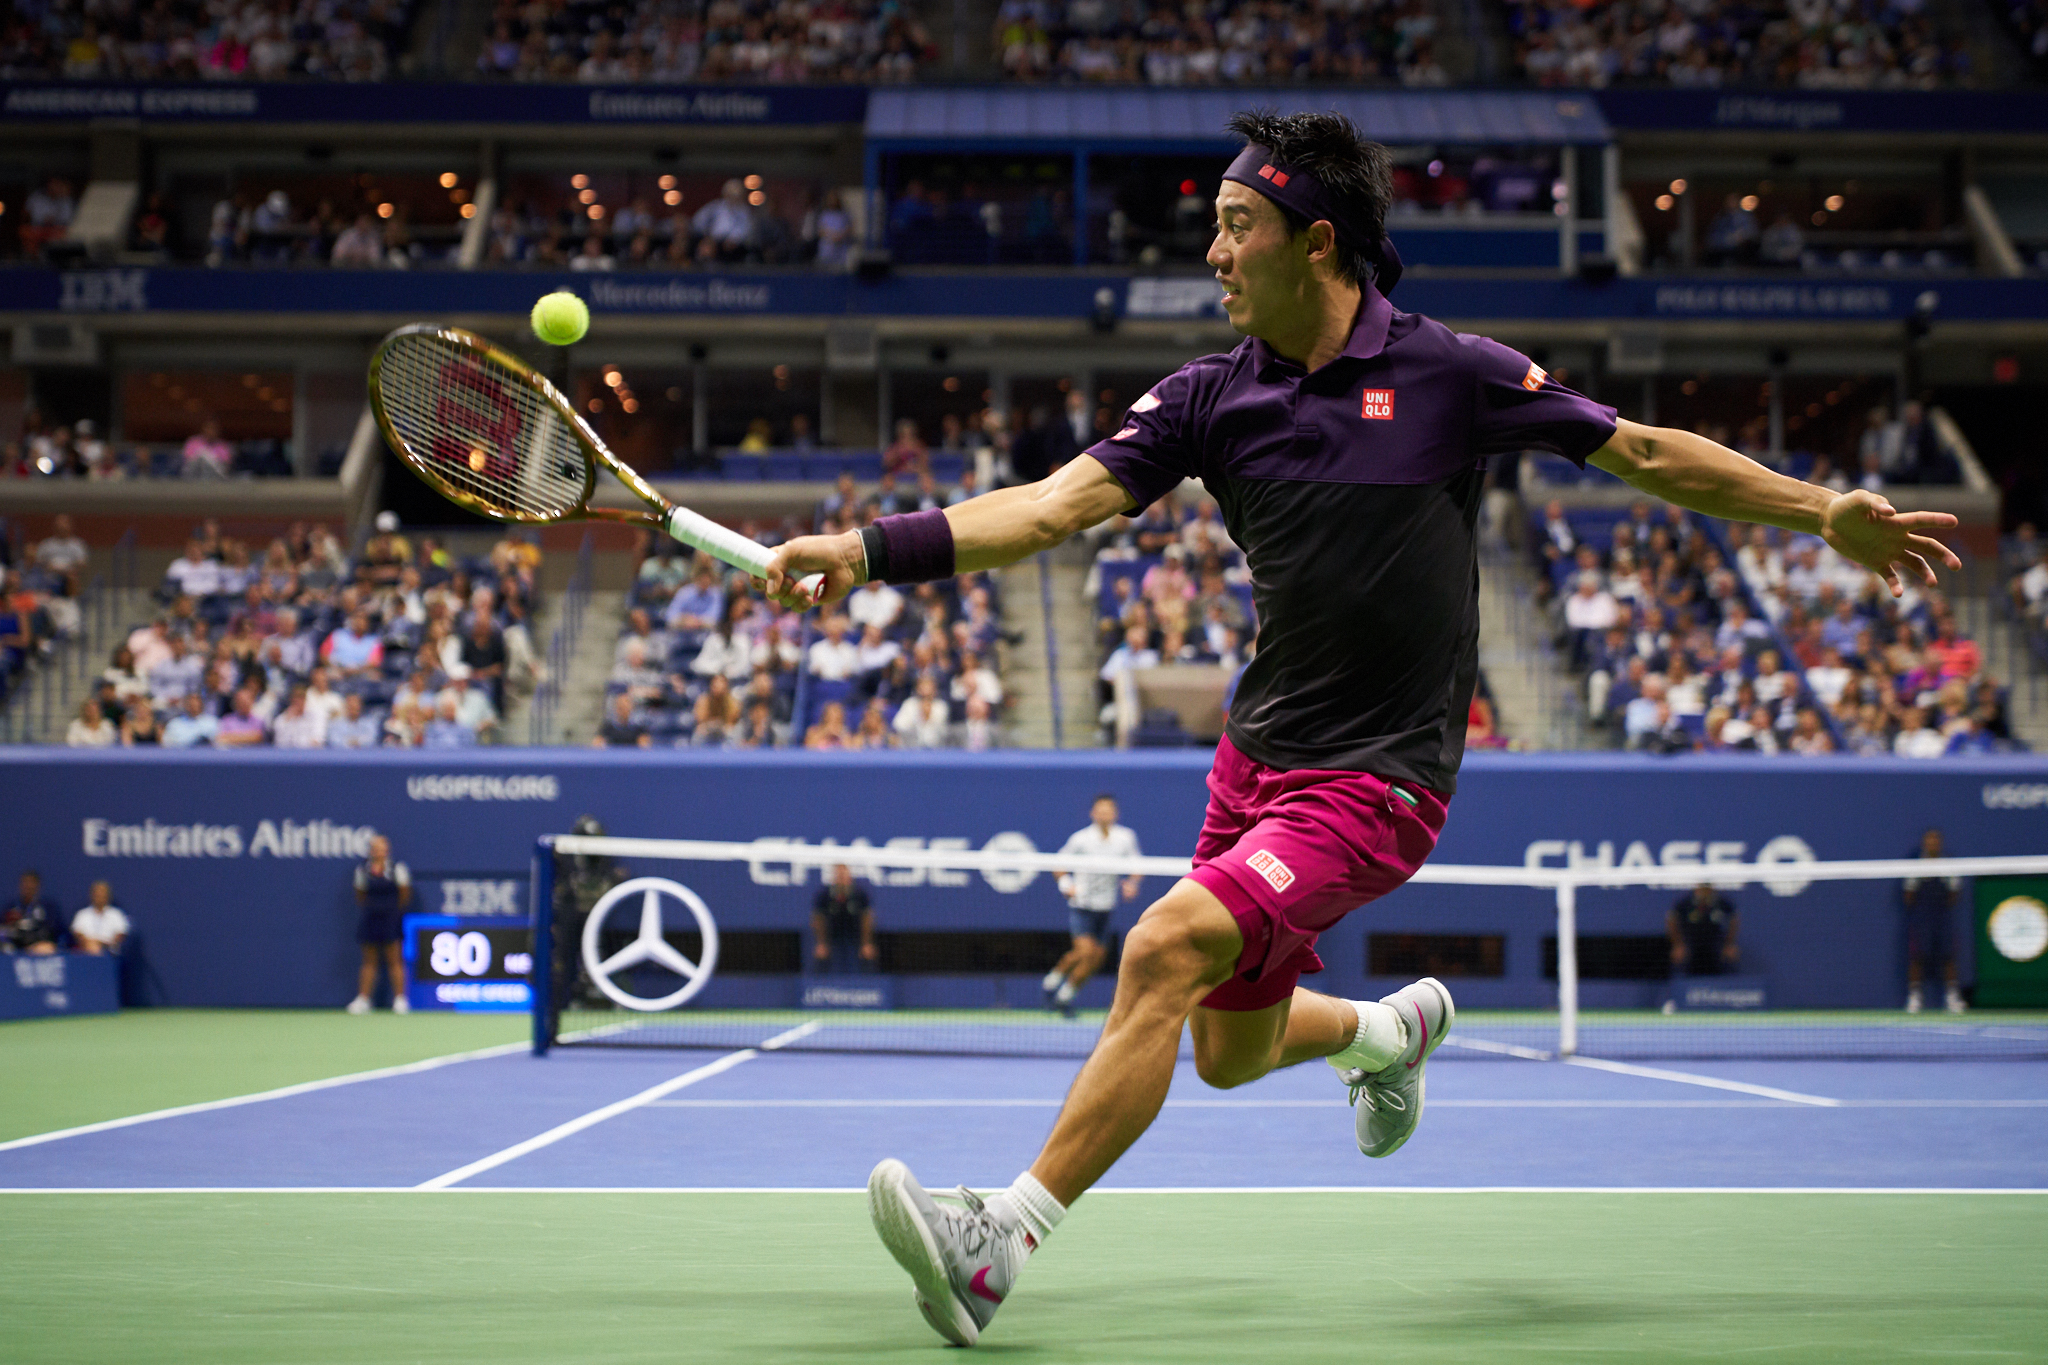 Kei Nishikori, Arthur Ashe Stadium, Men's Singles Semifinal  Sony A7rIII, Sony 24-70mm f2.8 GM